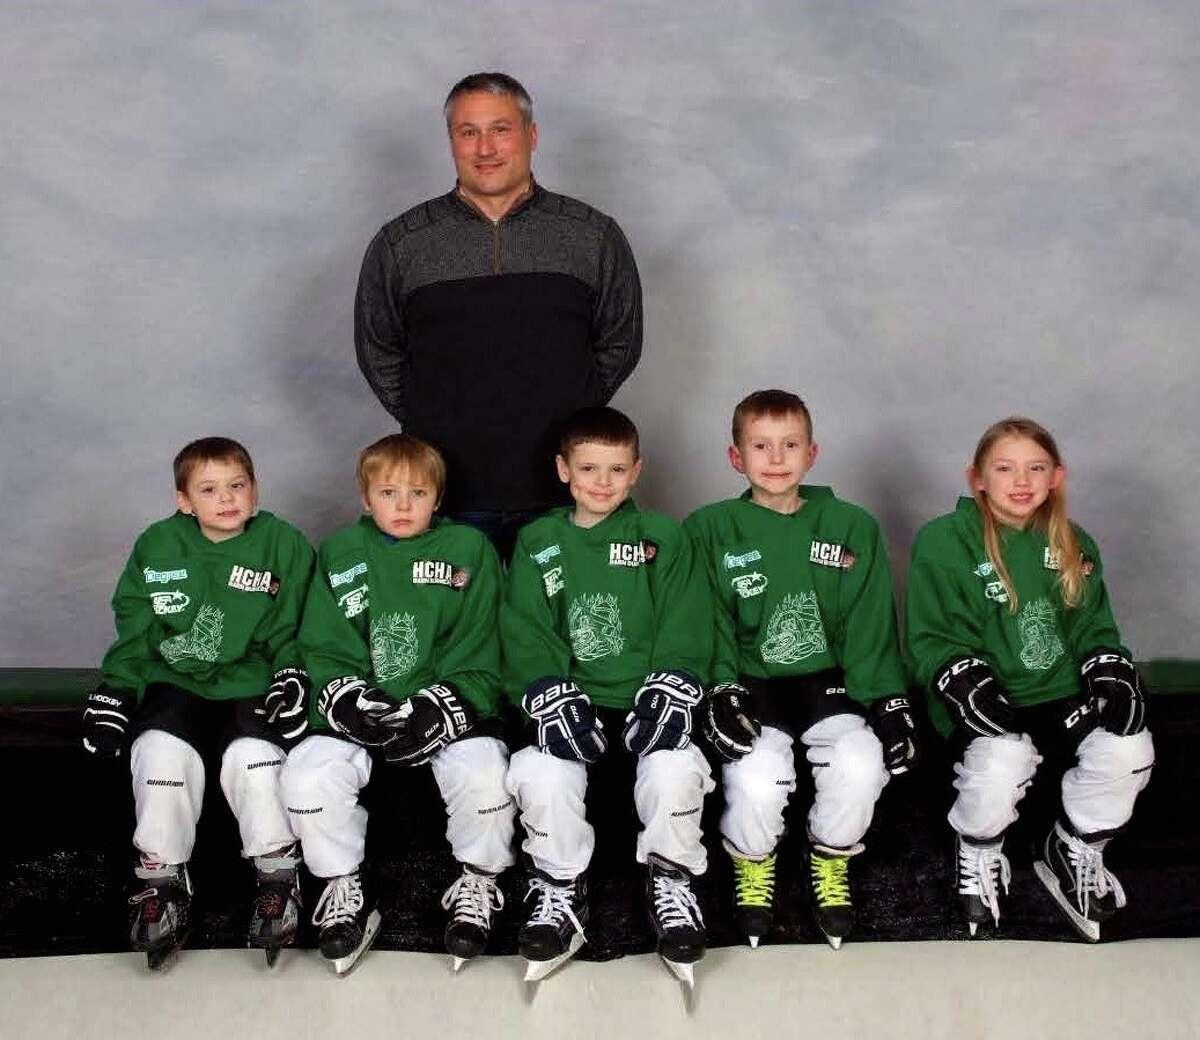 Green-Mini Mites Division 6U. Front row: Logan Bieri, Parker Braun, Gunner Nicholas, Ben Bolzman, Ava Krebs. Back Row: Coach Clint Braun.